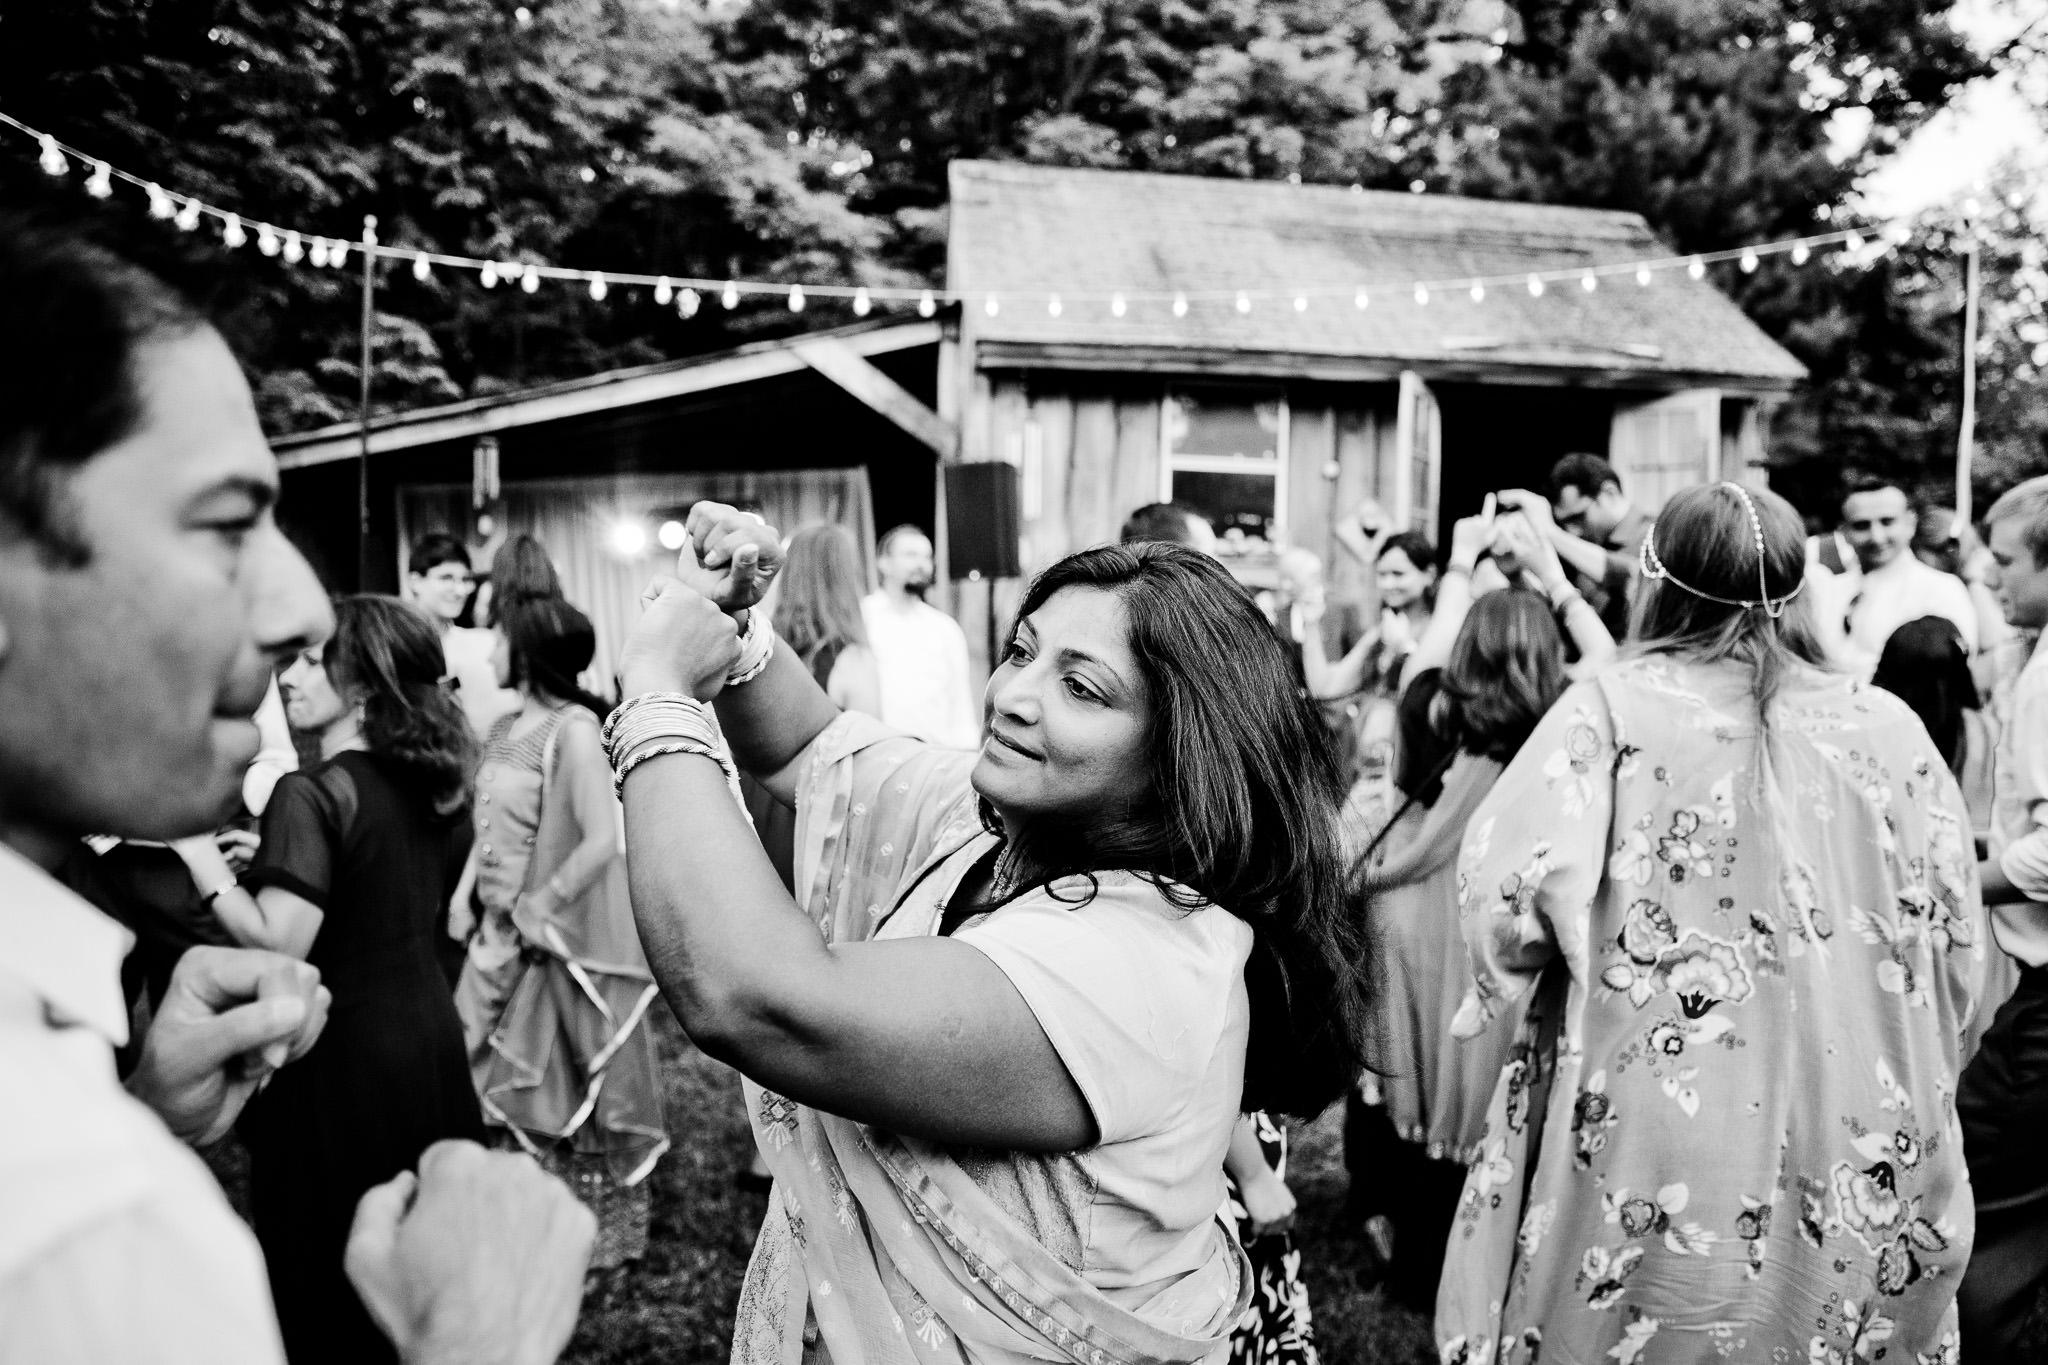 048_Canada-documentary-wedding-photograp